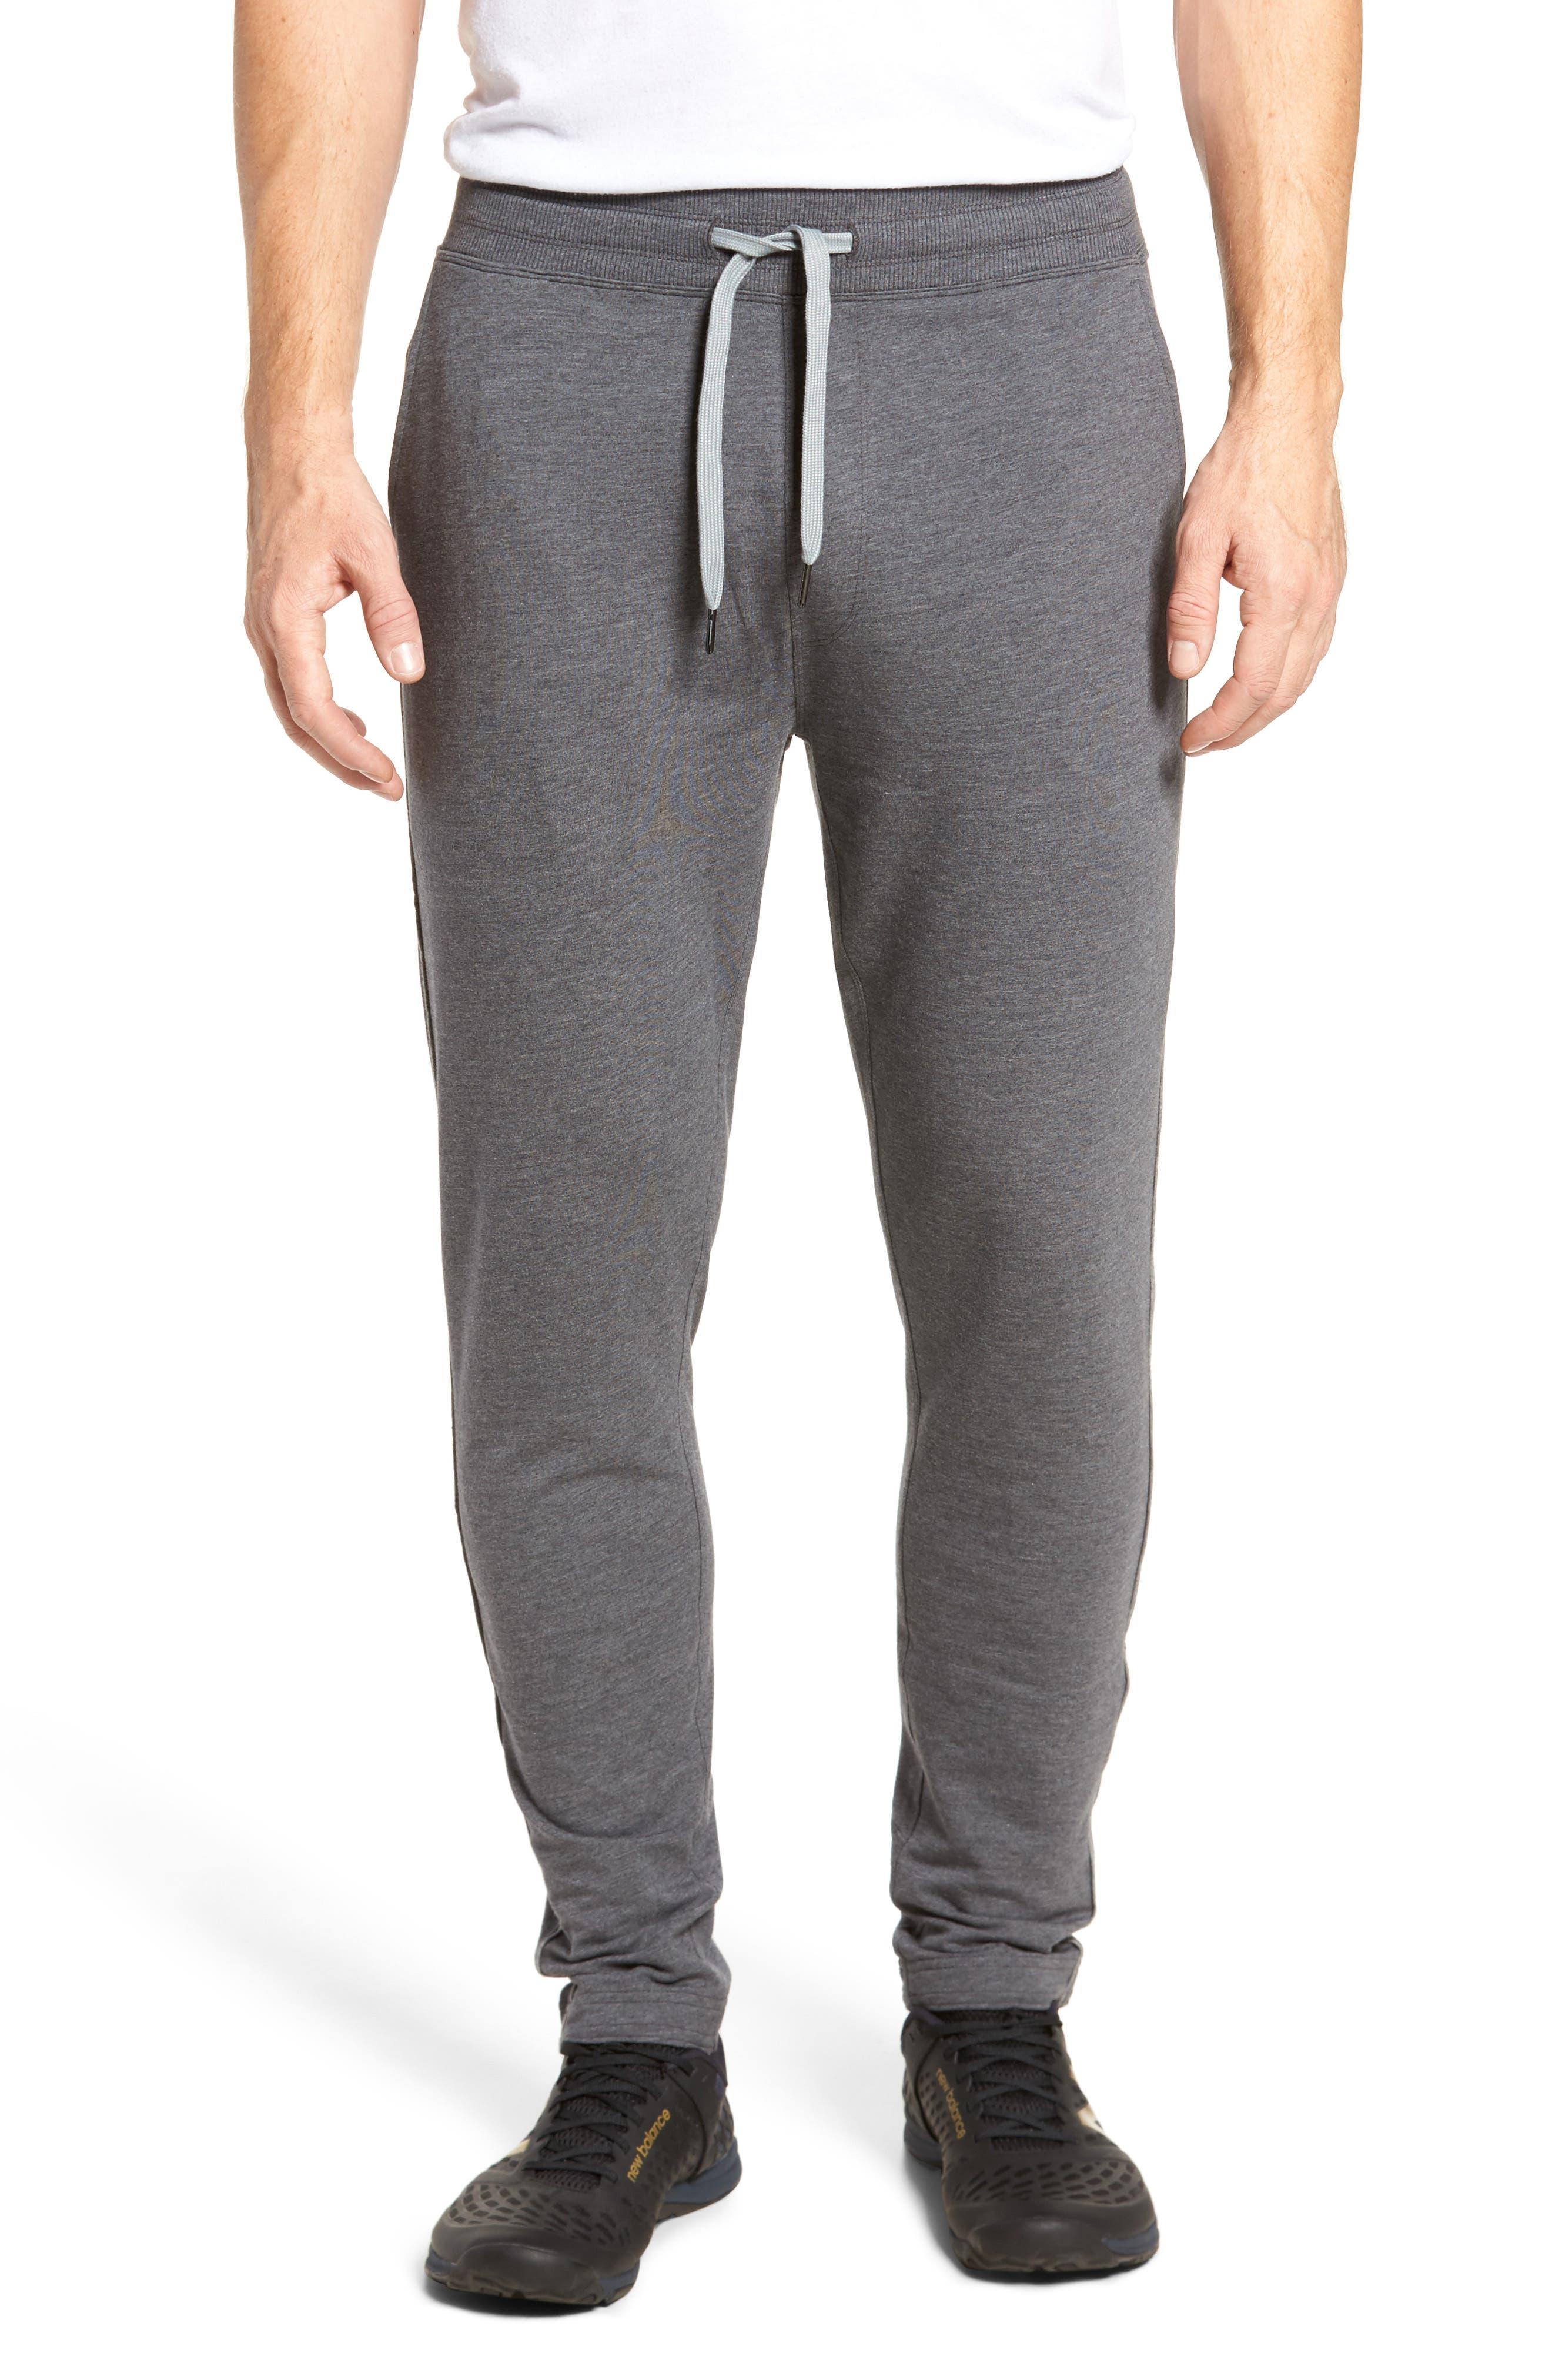 Legacy Sweatpants,                         Main,                         color, Black Heather